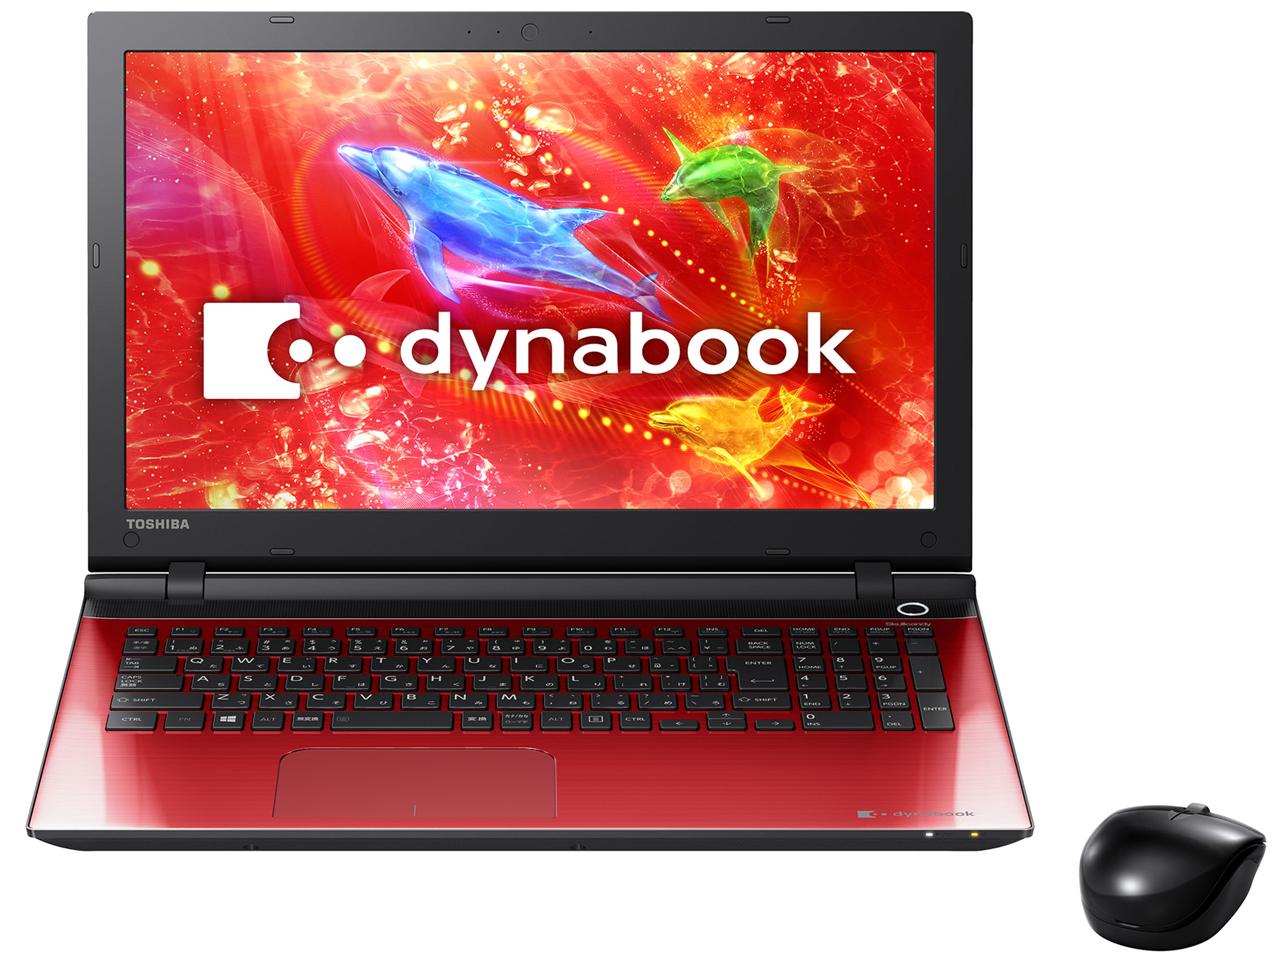 dynabook T75 T75/RR PT75RRP-HHA [モデナレッド] の製品画像